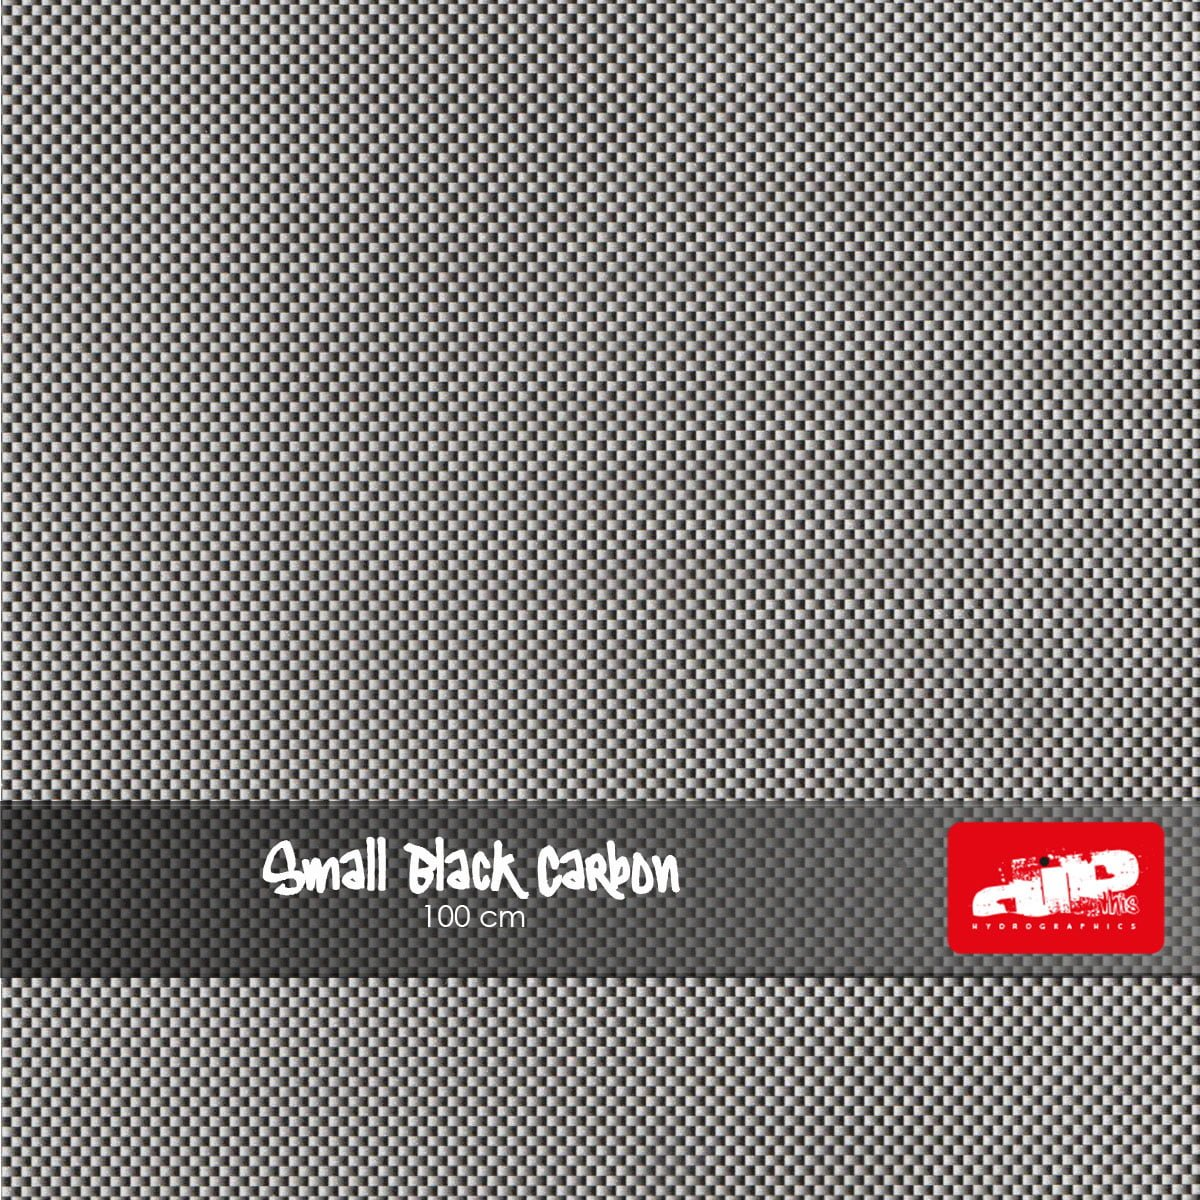 Small Black Carbon